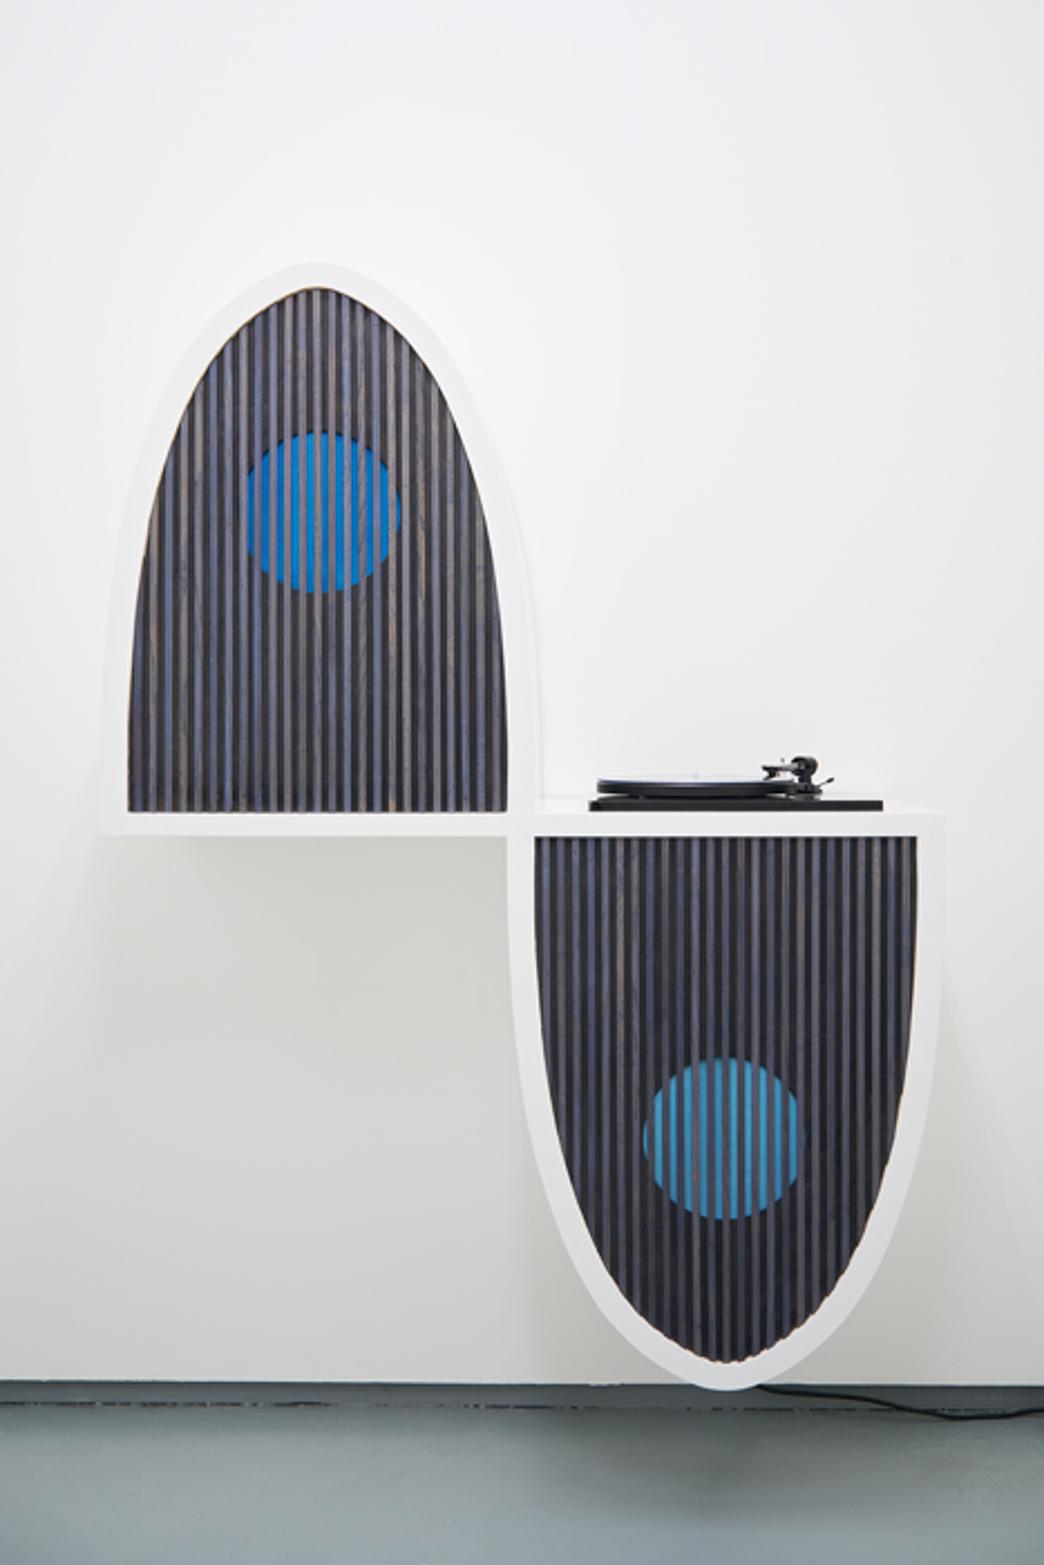 David Ferrando Giraut, The Sea and the Waves, 2015. Tenderpixel.